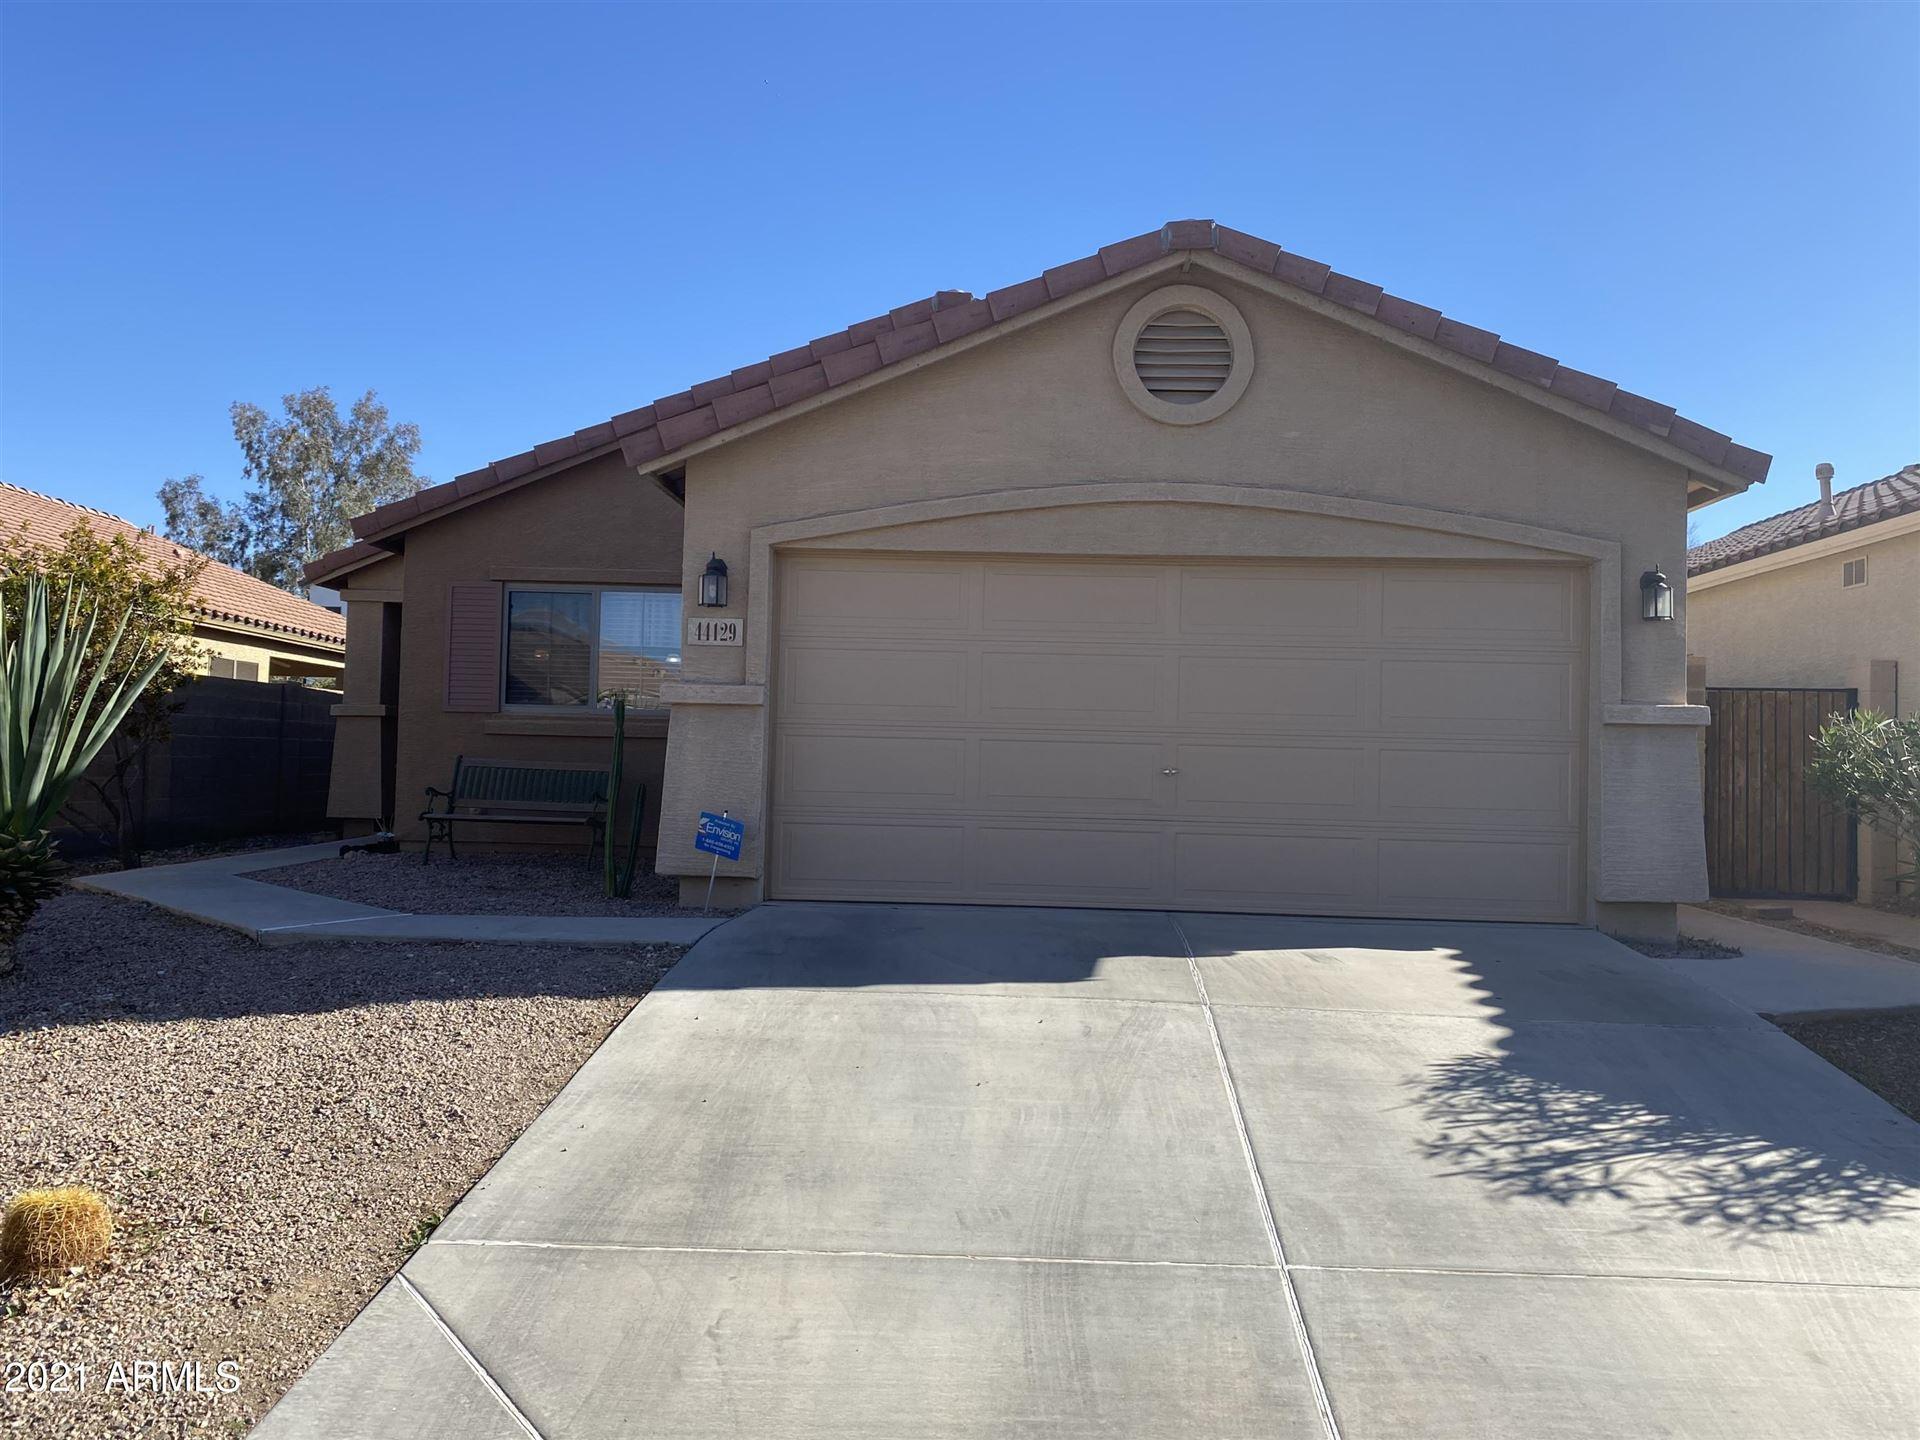 Photo of 44129 W NEELY Drive, Maricopa, AZ 85138 (MLS # 6200400)